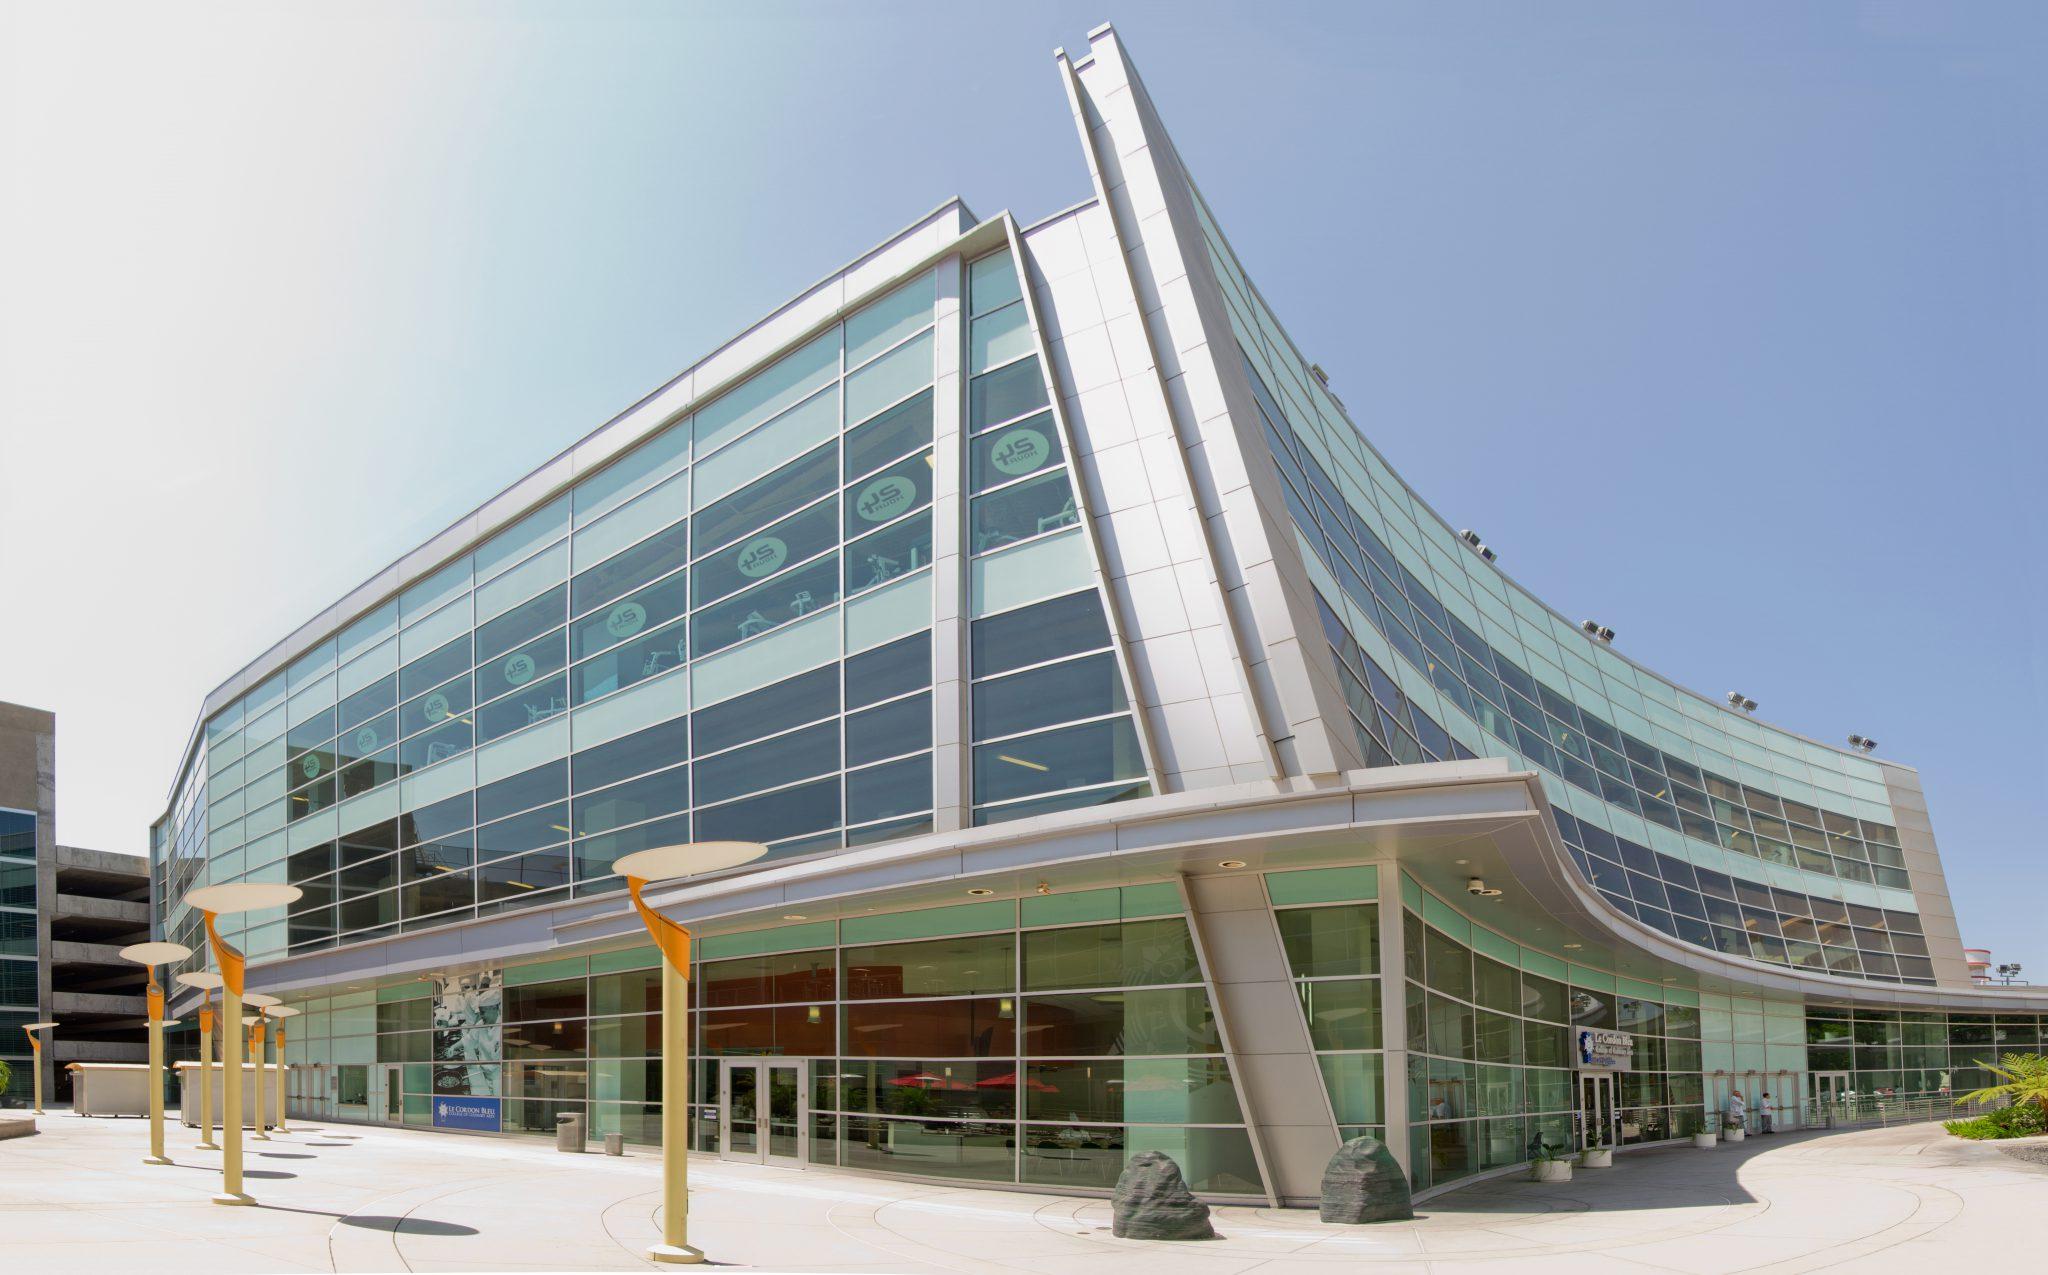 Cinerama Dome Entertainment Center